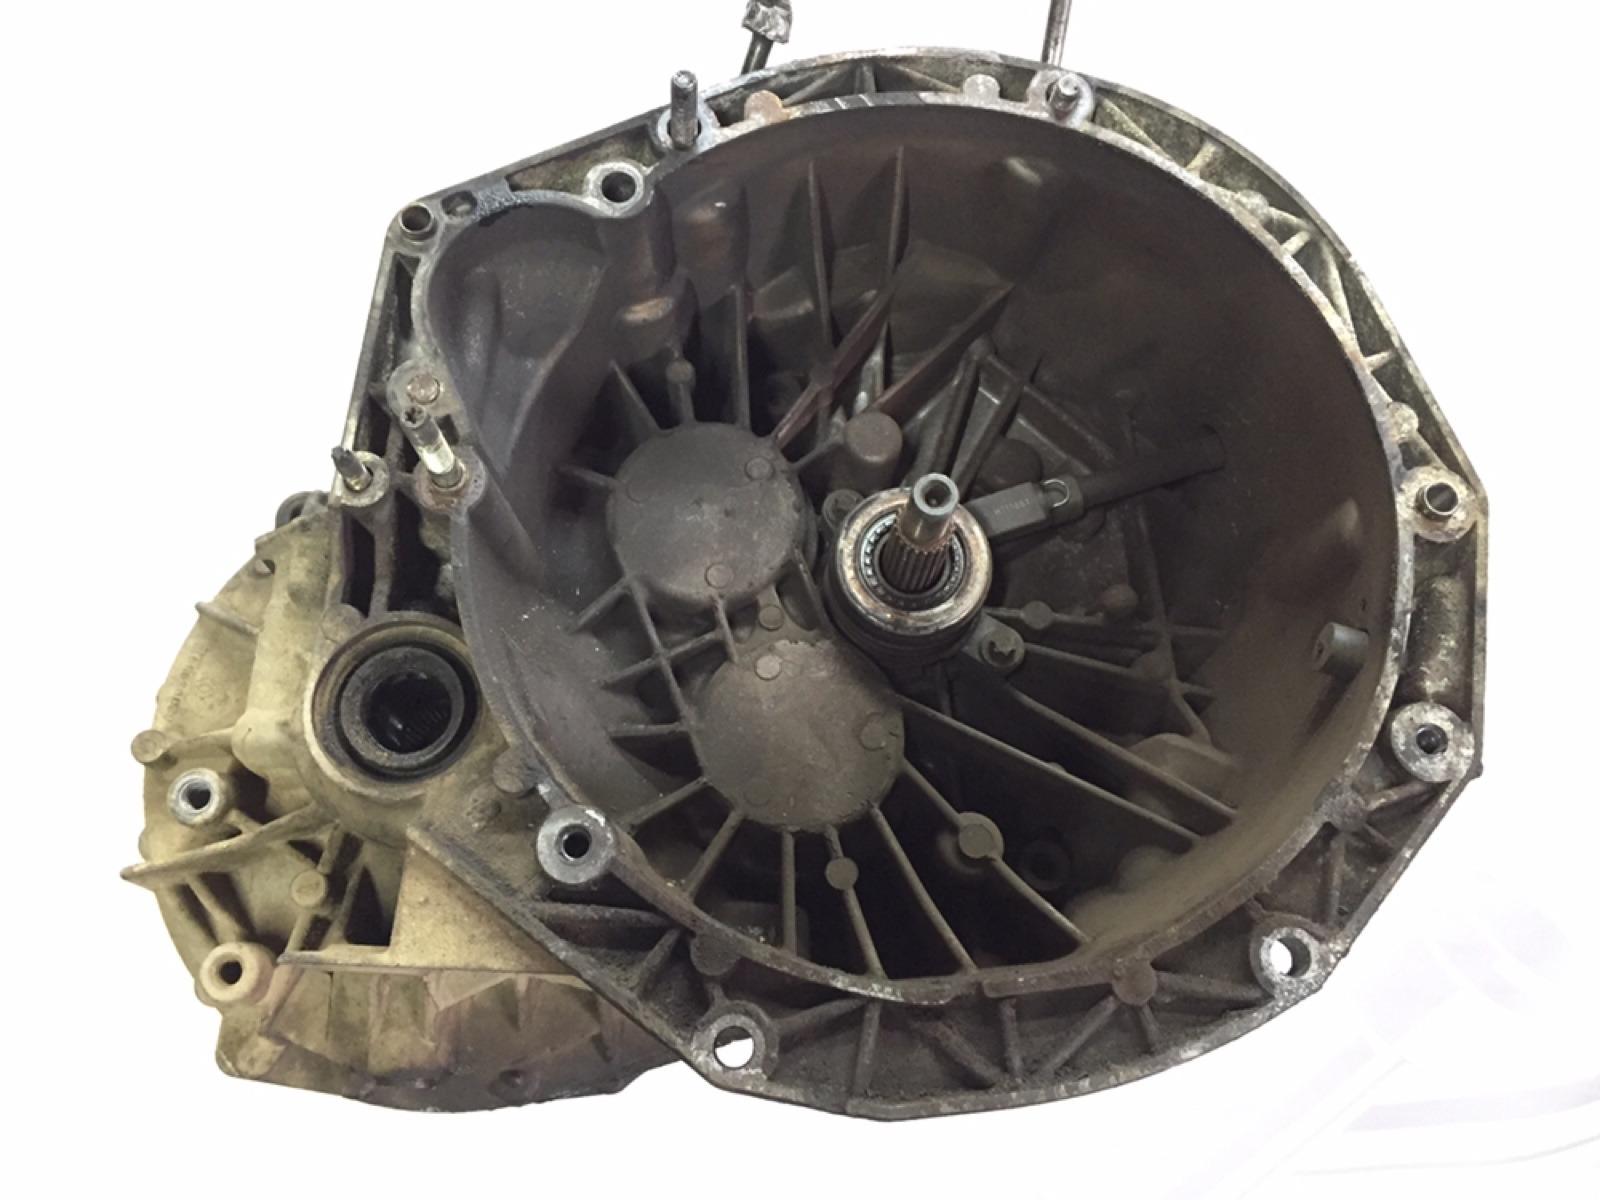 Кпп механическая (мкпп) Opel Vivaro 1.9 CDTI 2005 (б/у)